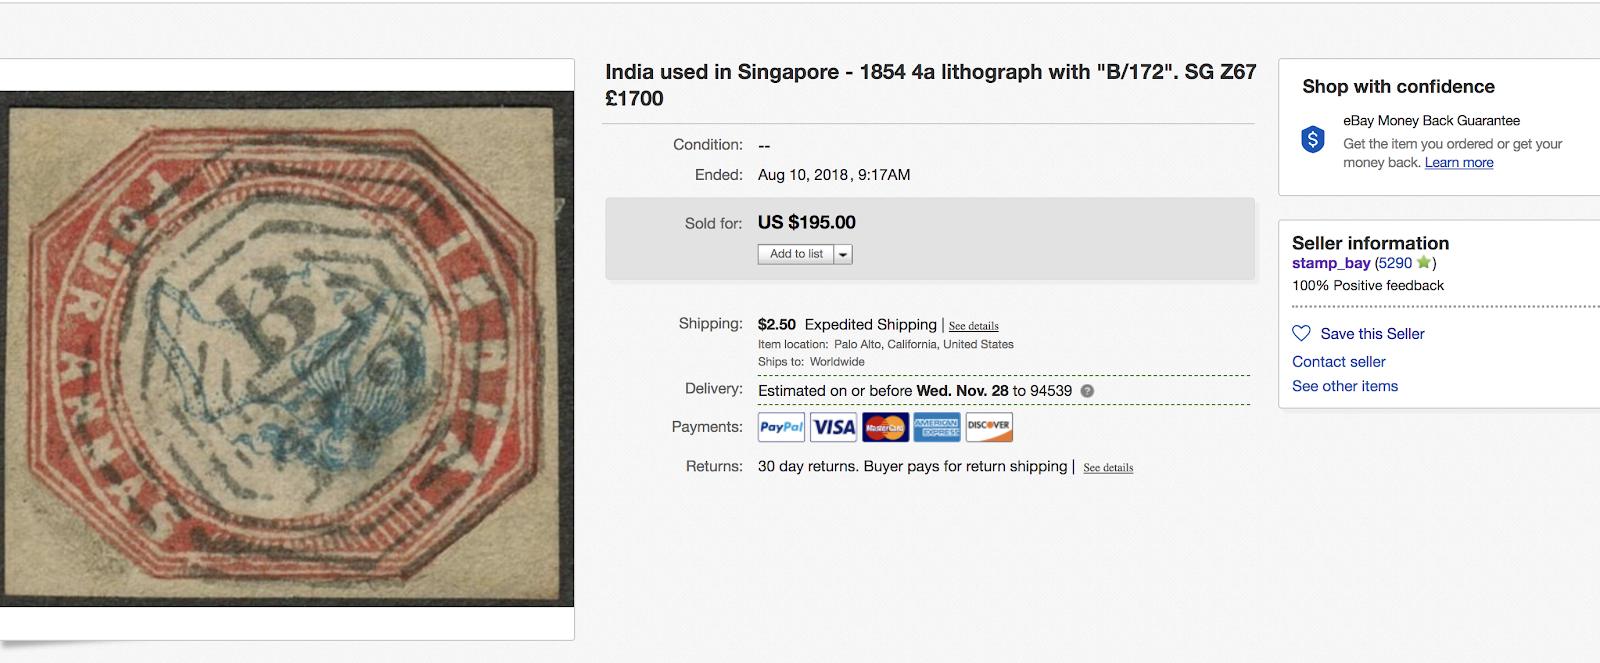 GANDHI STAMPS CLUB: Indian Philately - India used Singapore